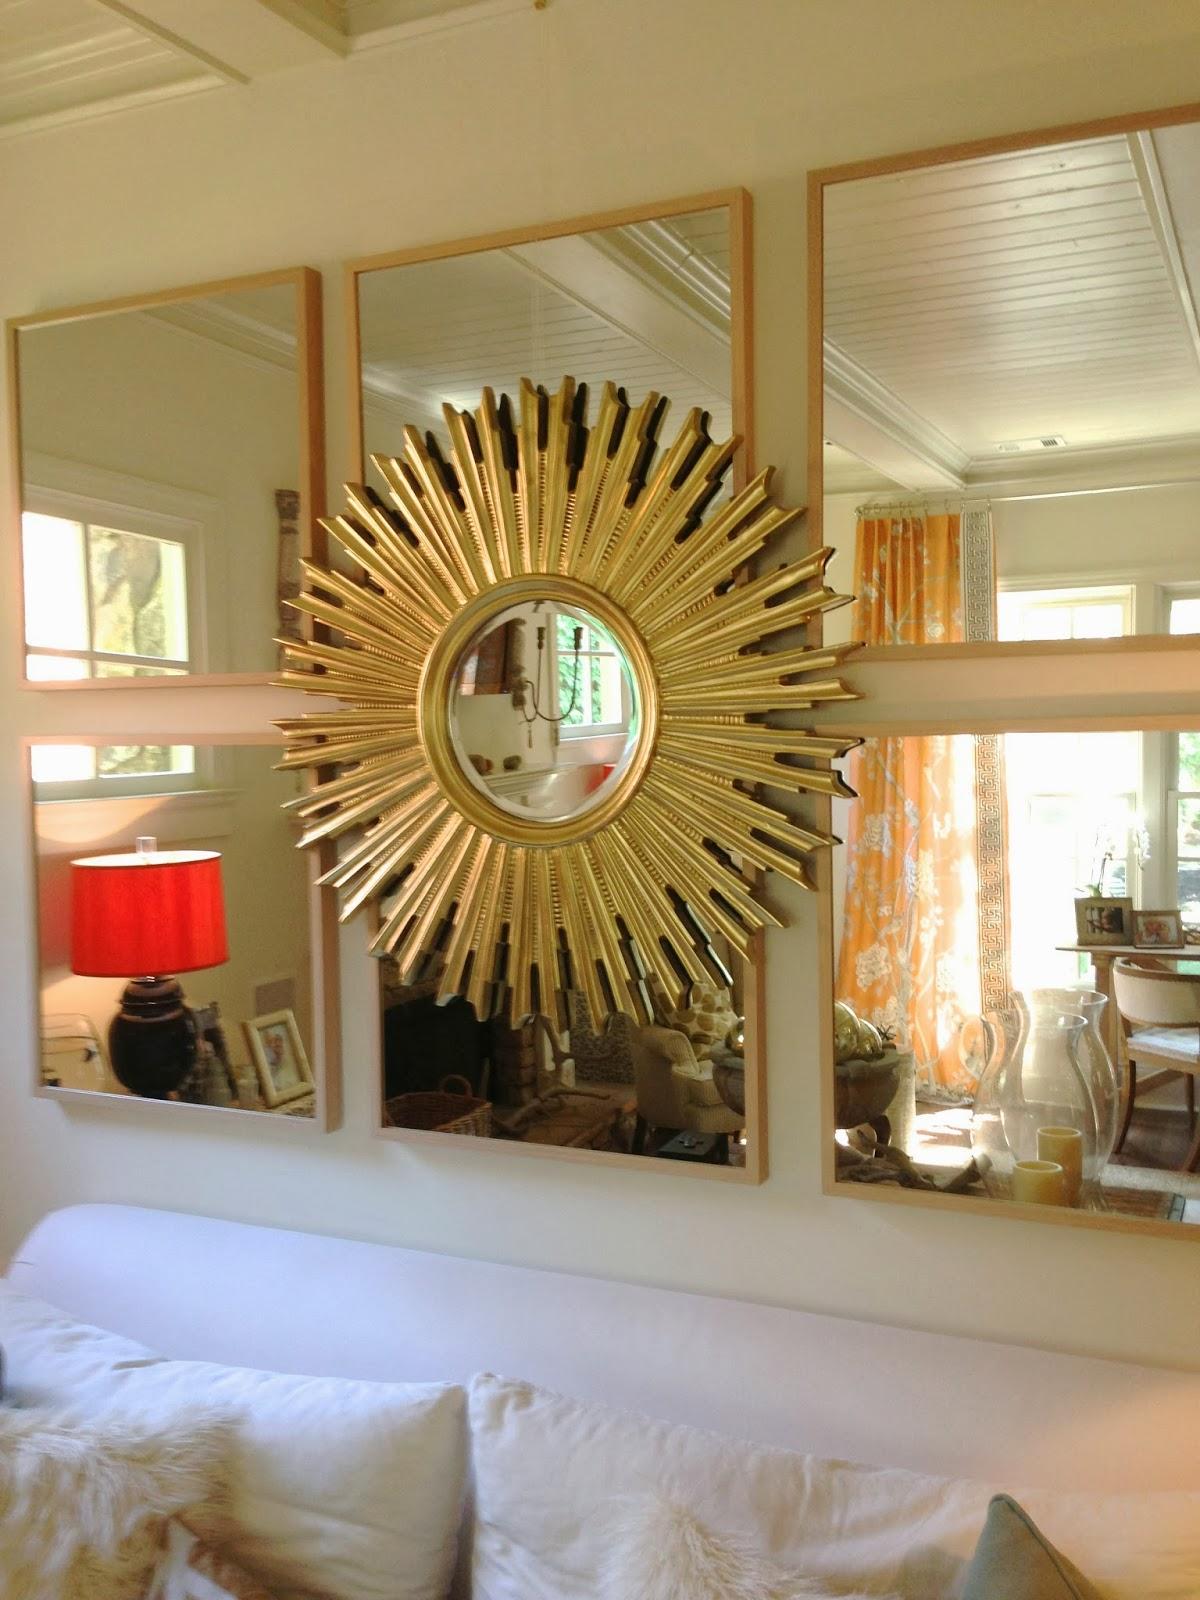 Design Indulgence A DESIGNERS HOME - Designers home